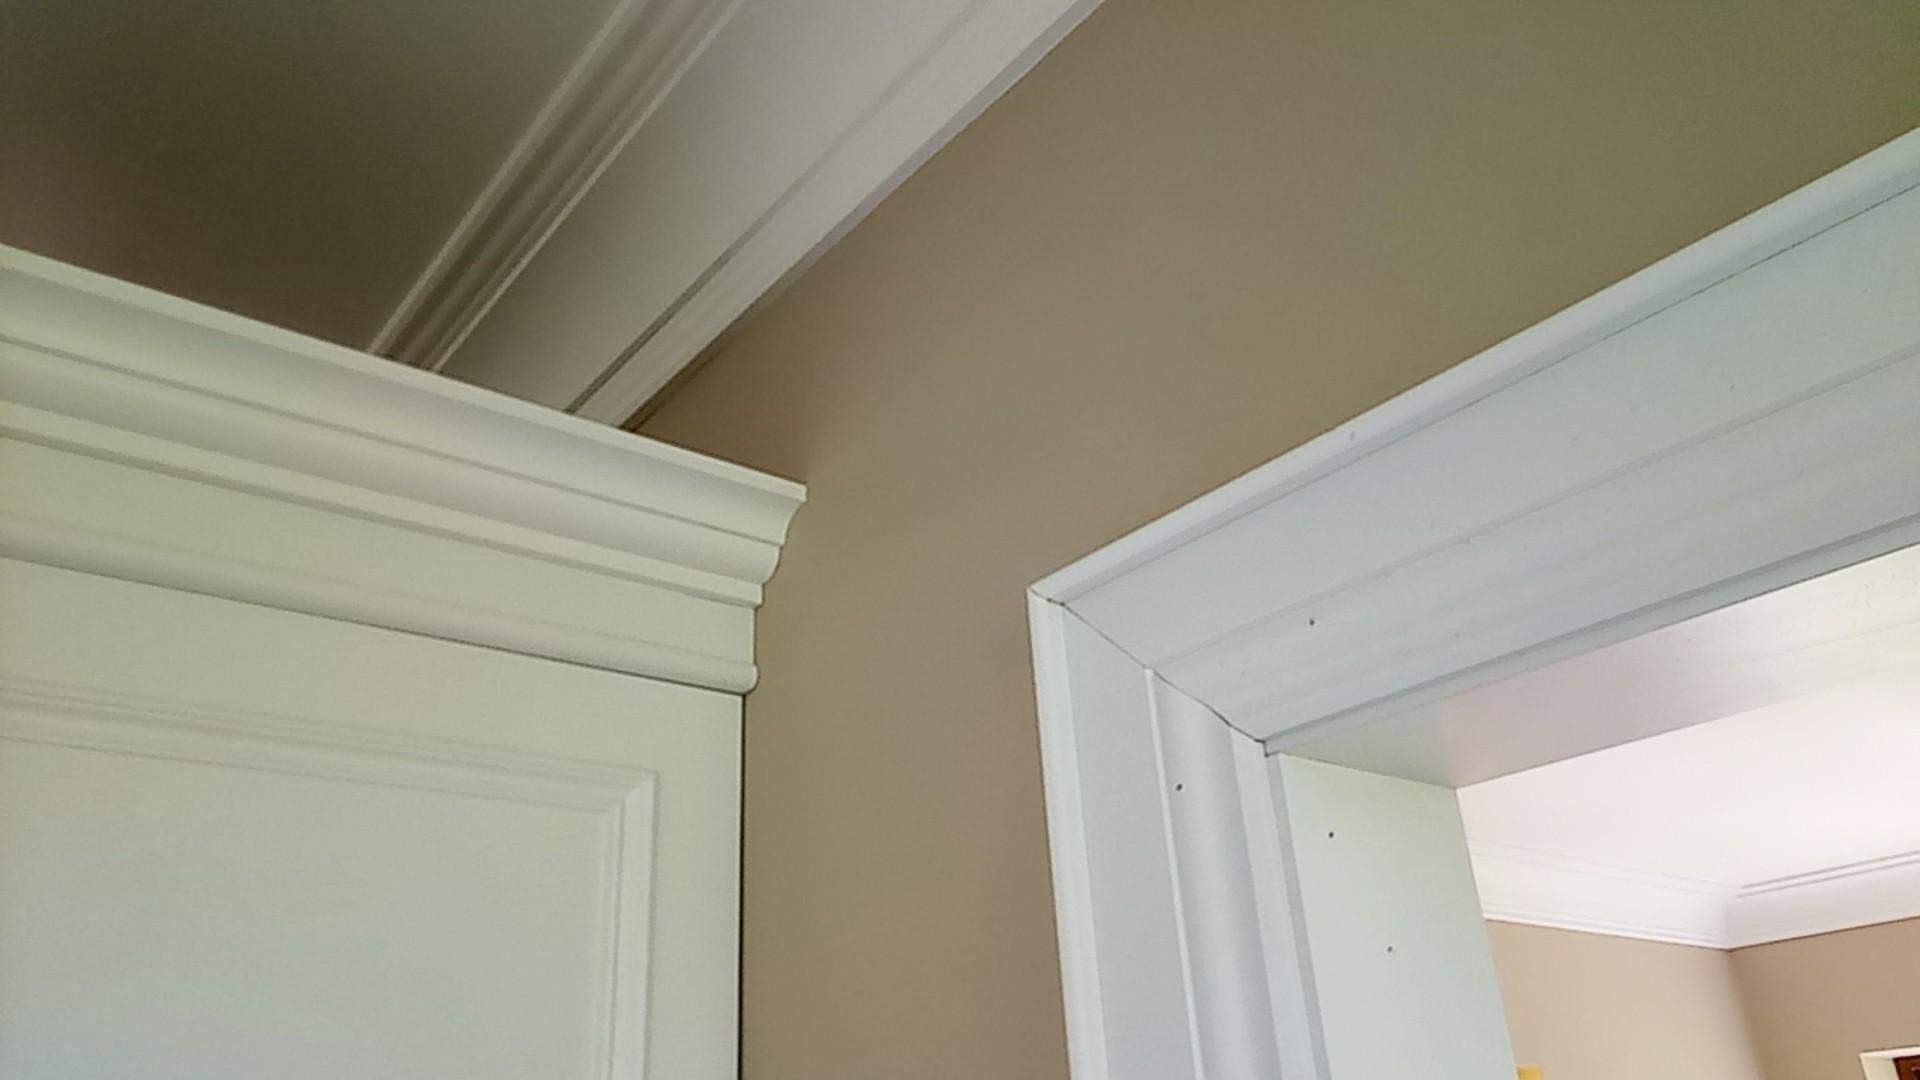 Sztukateria sufitowa drewniana